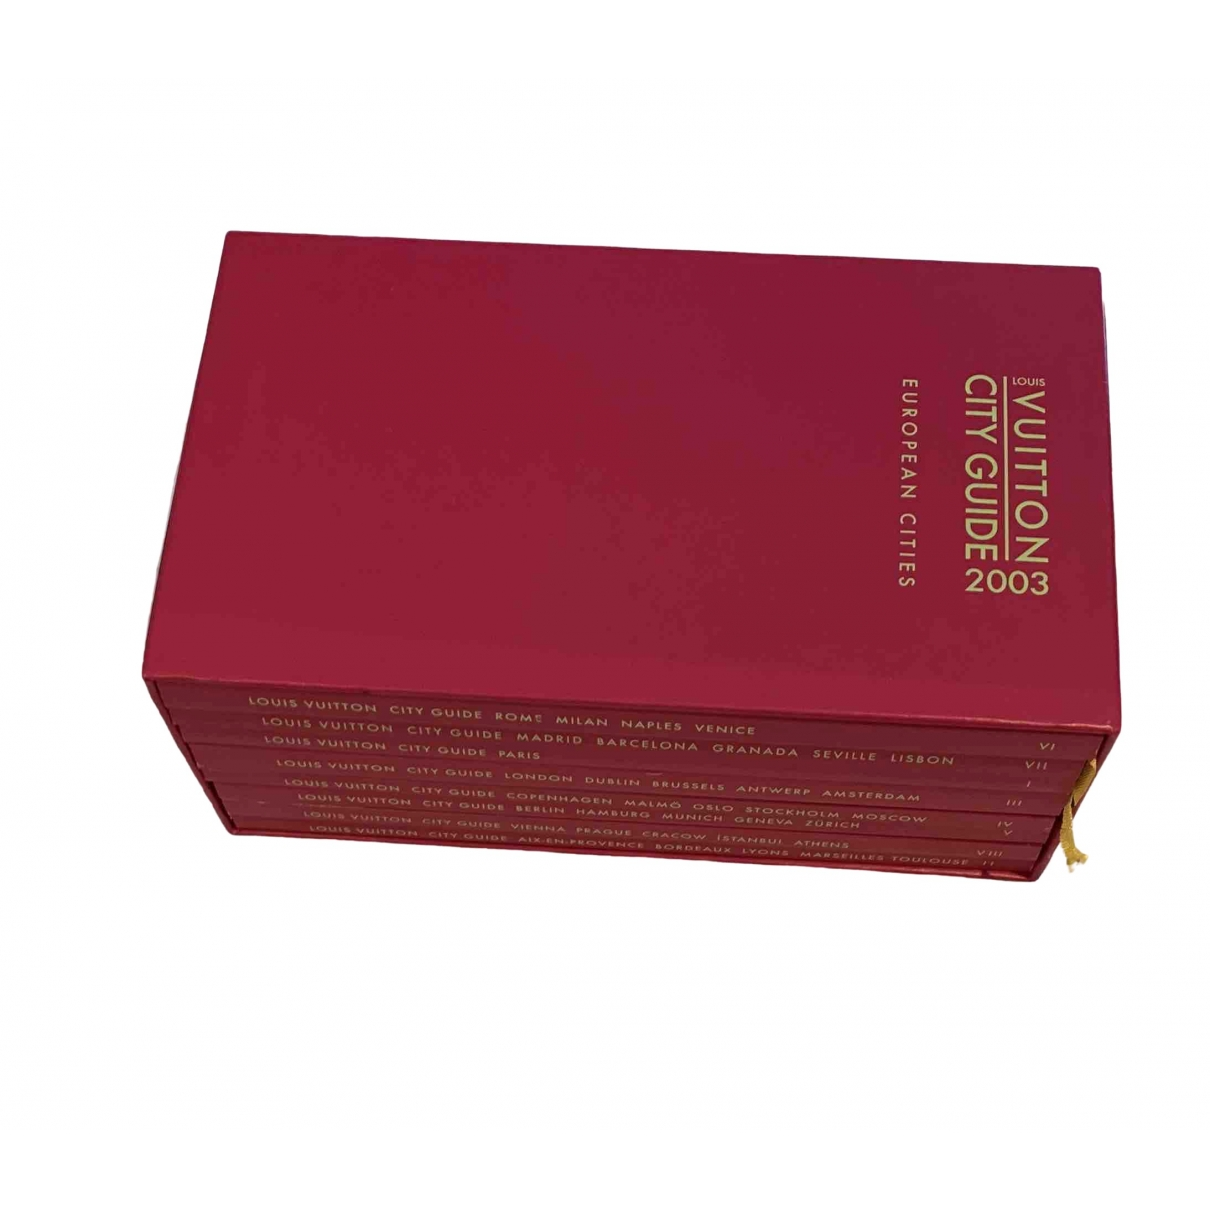 Louis Vuitton City Guide Reisen Rot